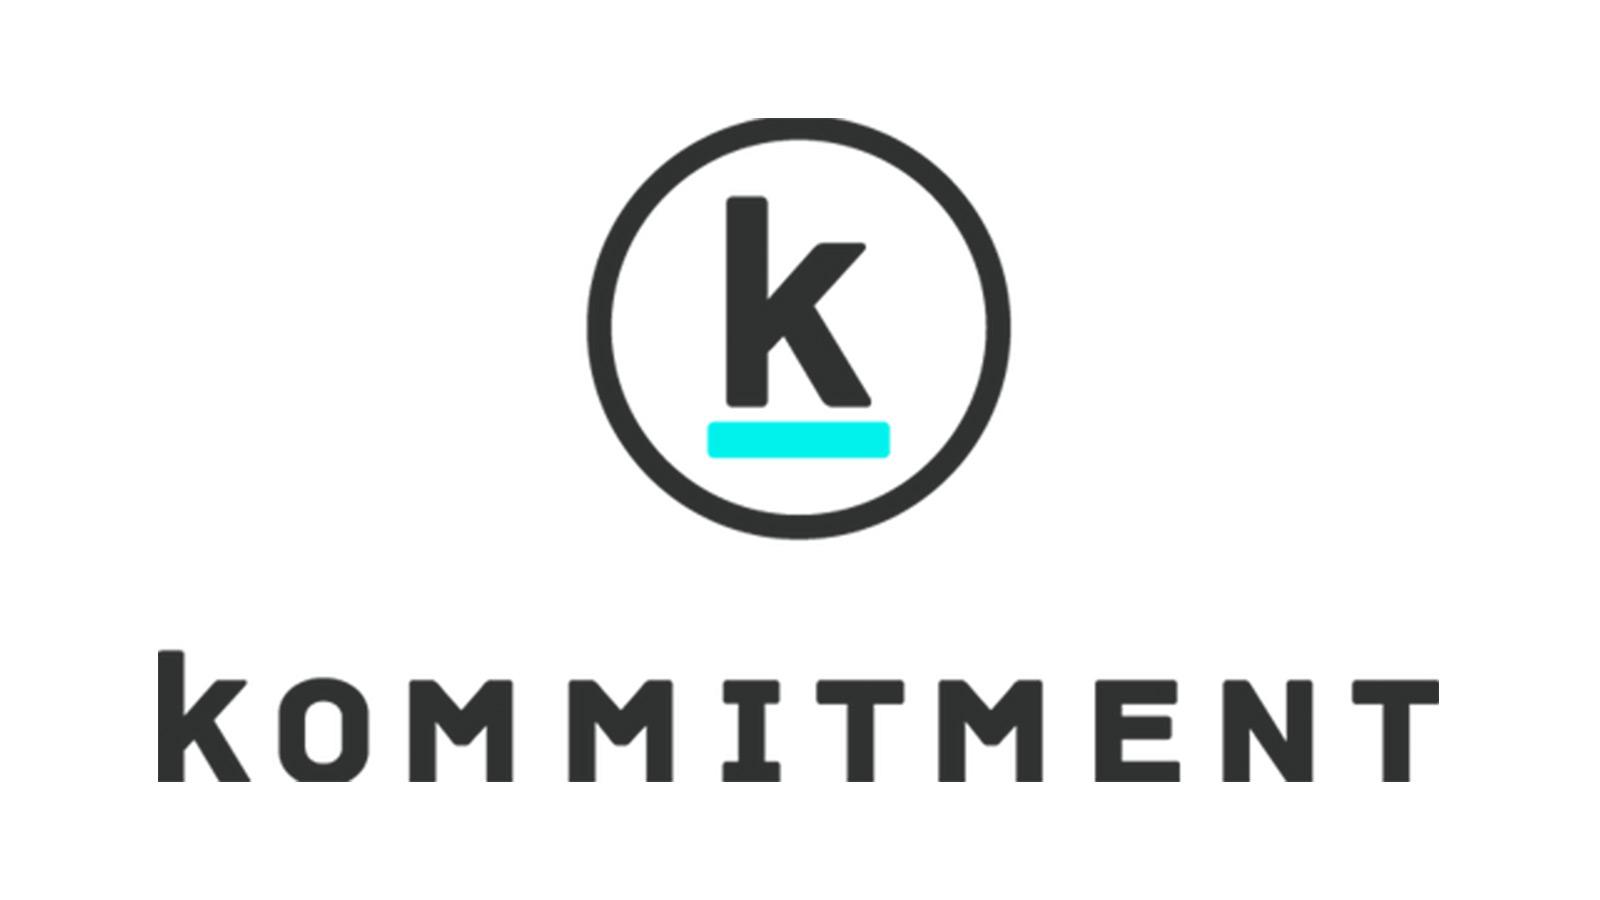 kommitment